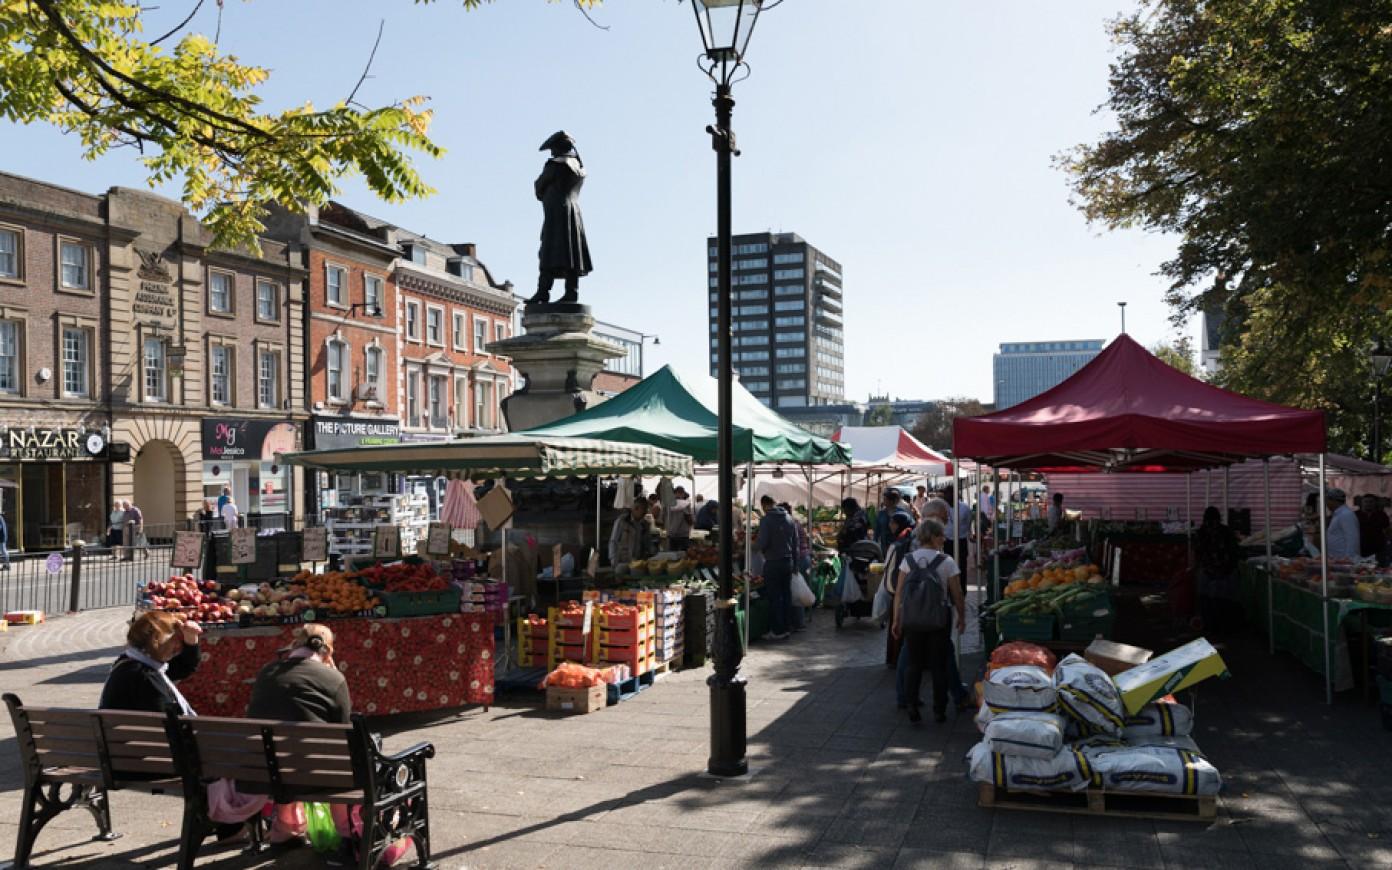 Bedford Market Square